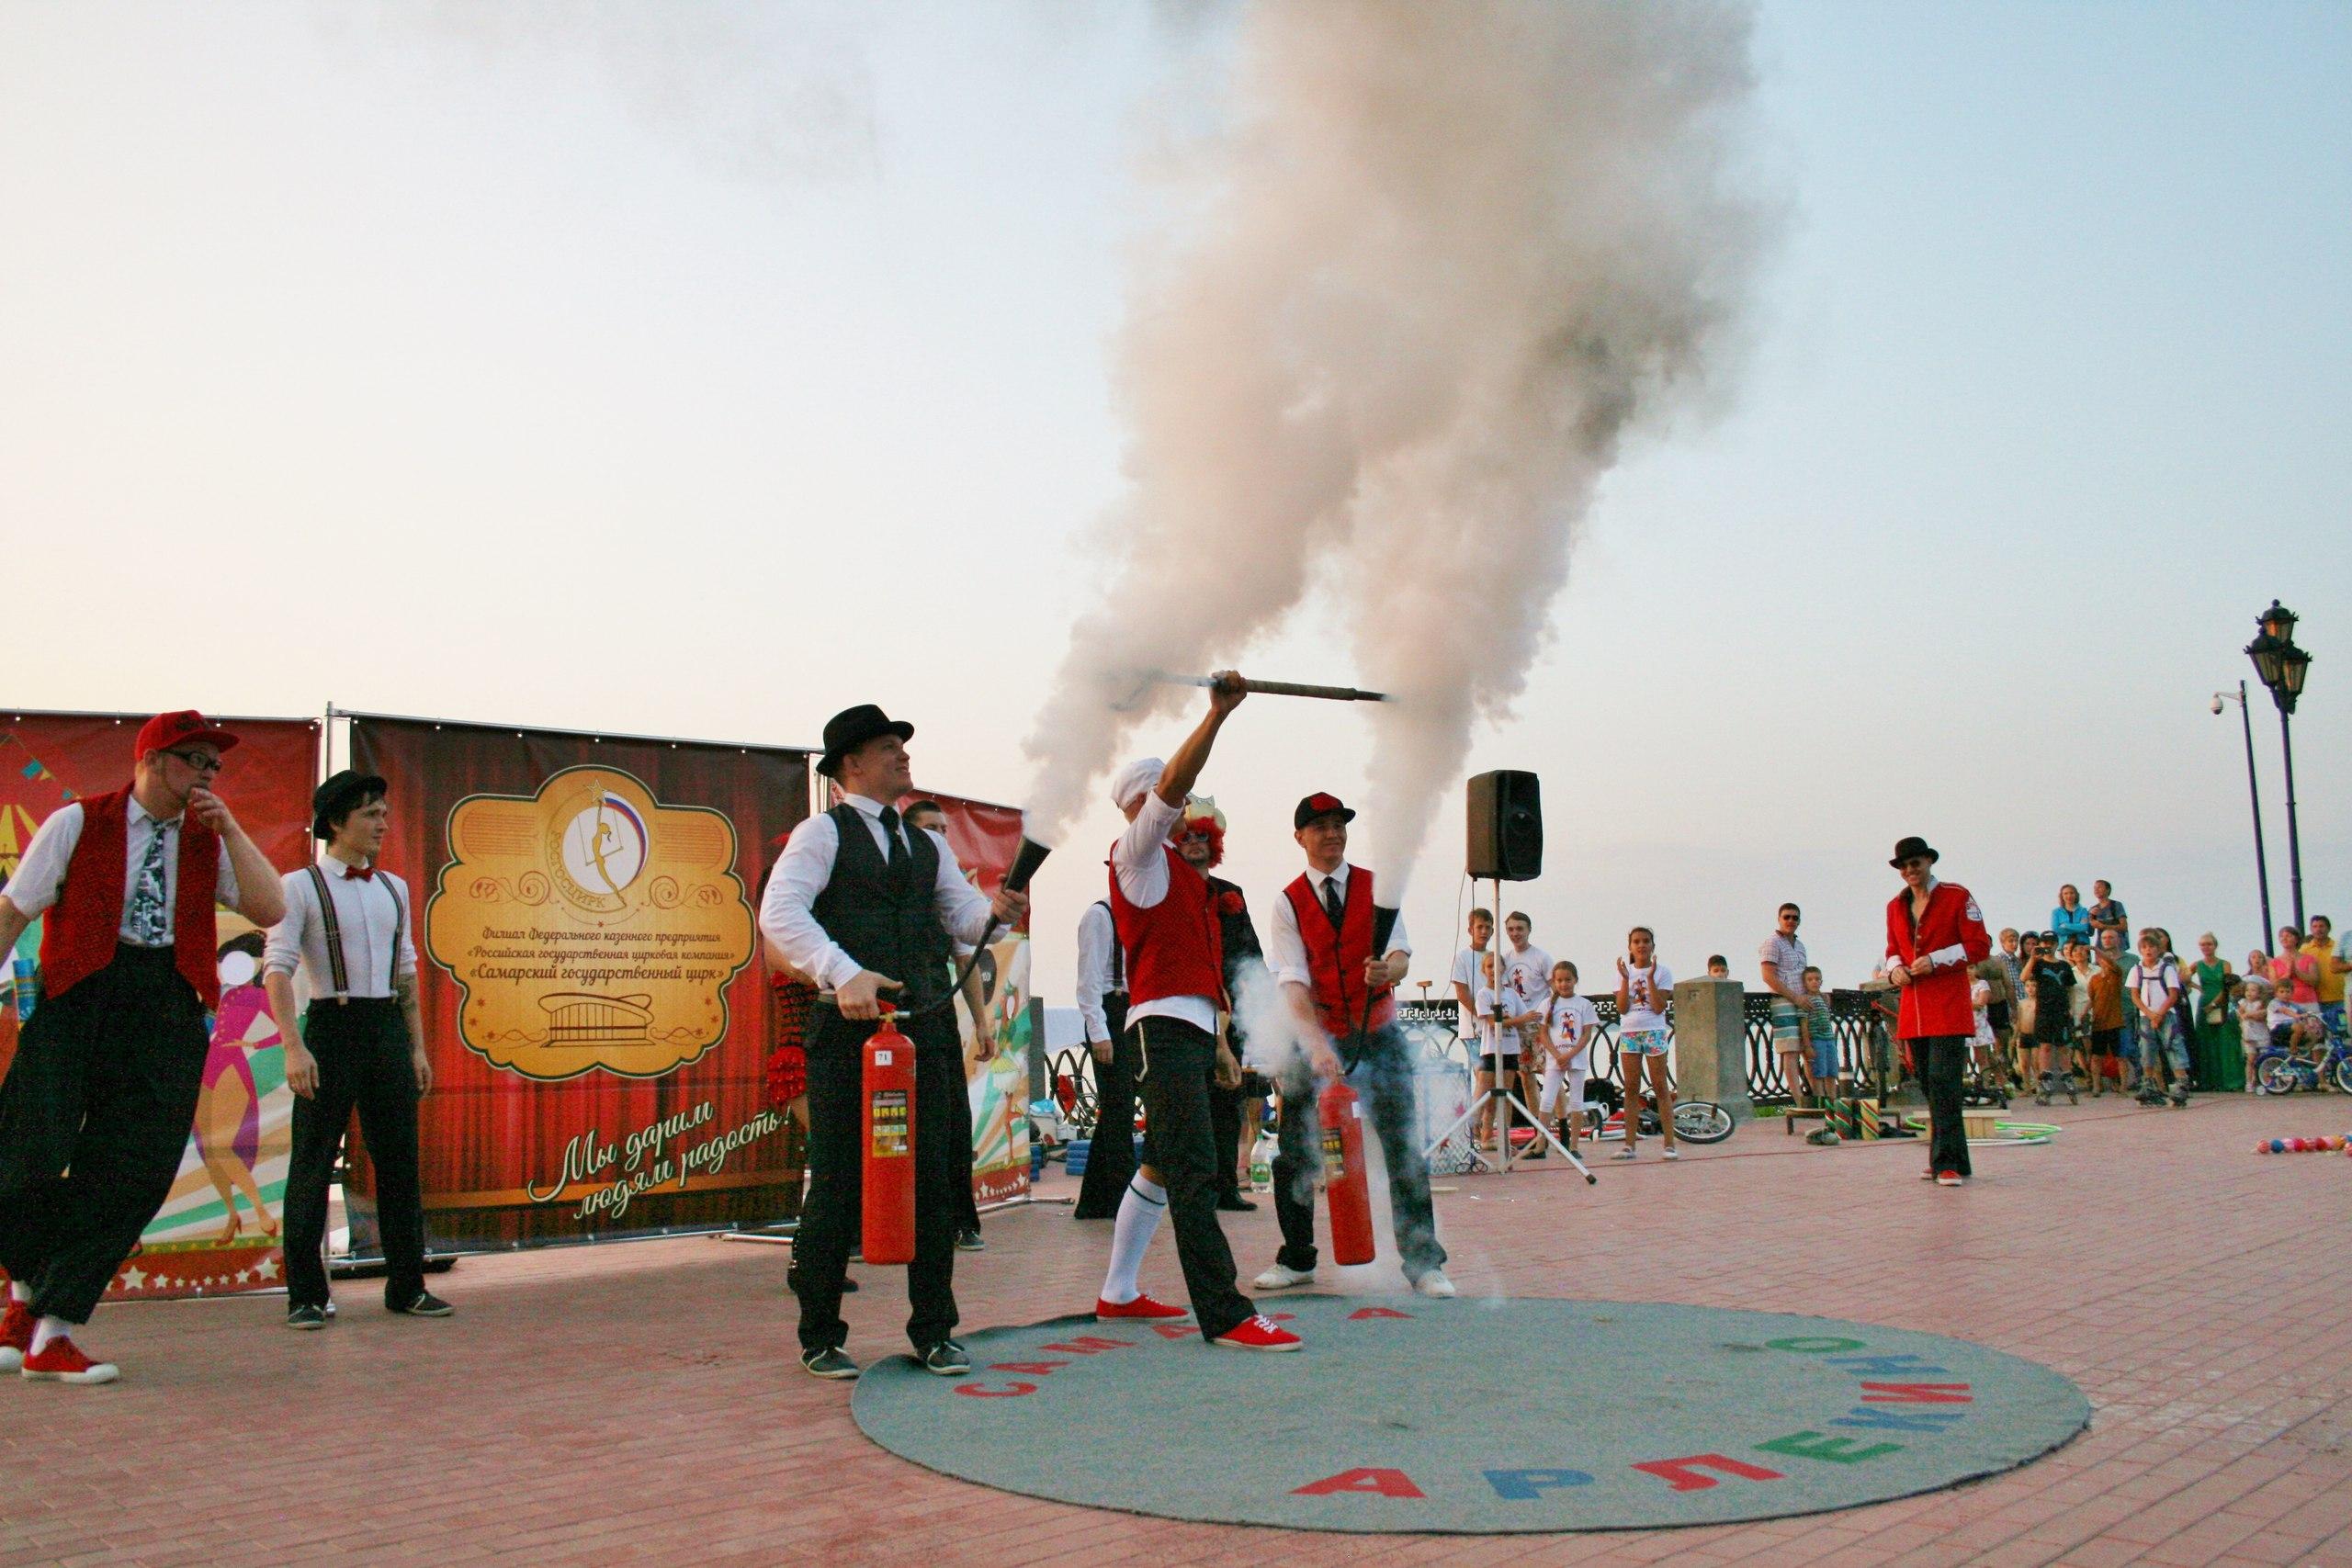 кировский цирк арлекино фото или